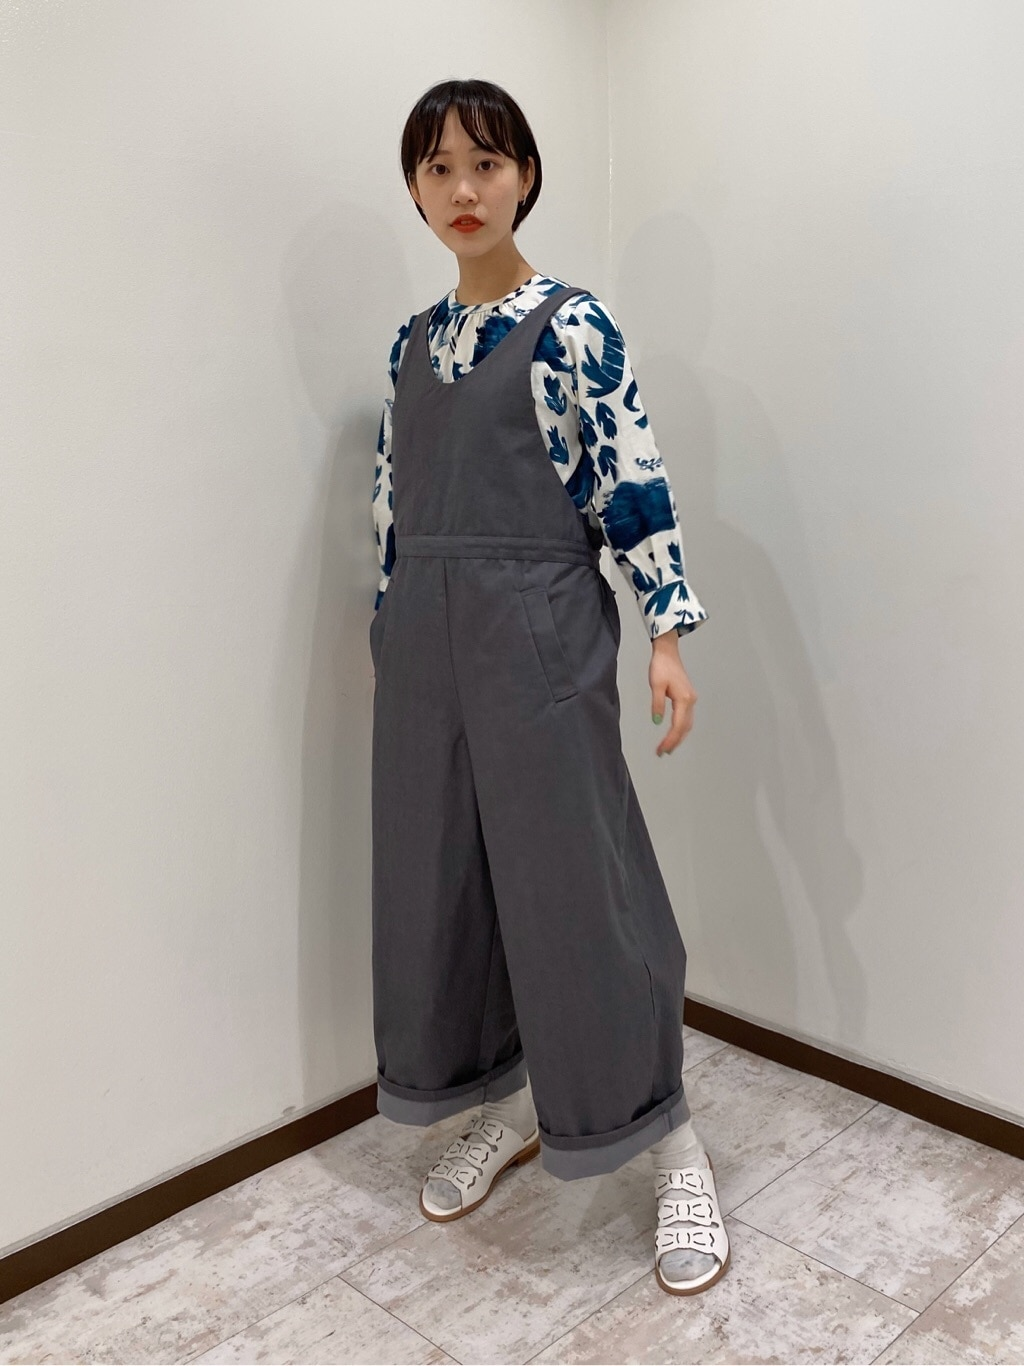 l'atelier du savon 新宿ミロード 身長:159cm 2020.04.02